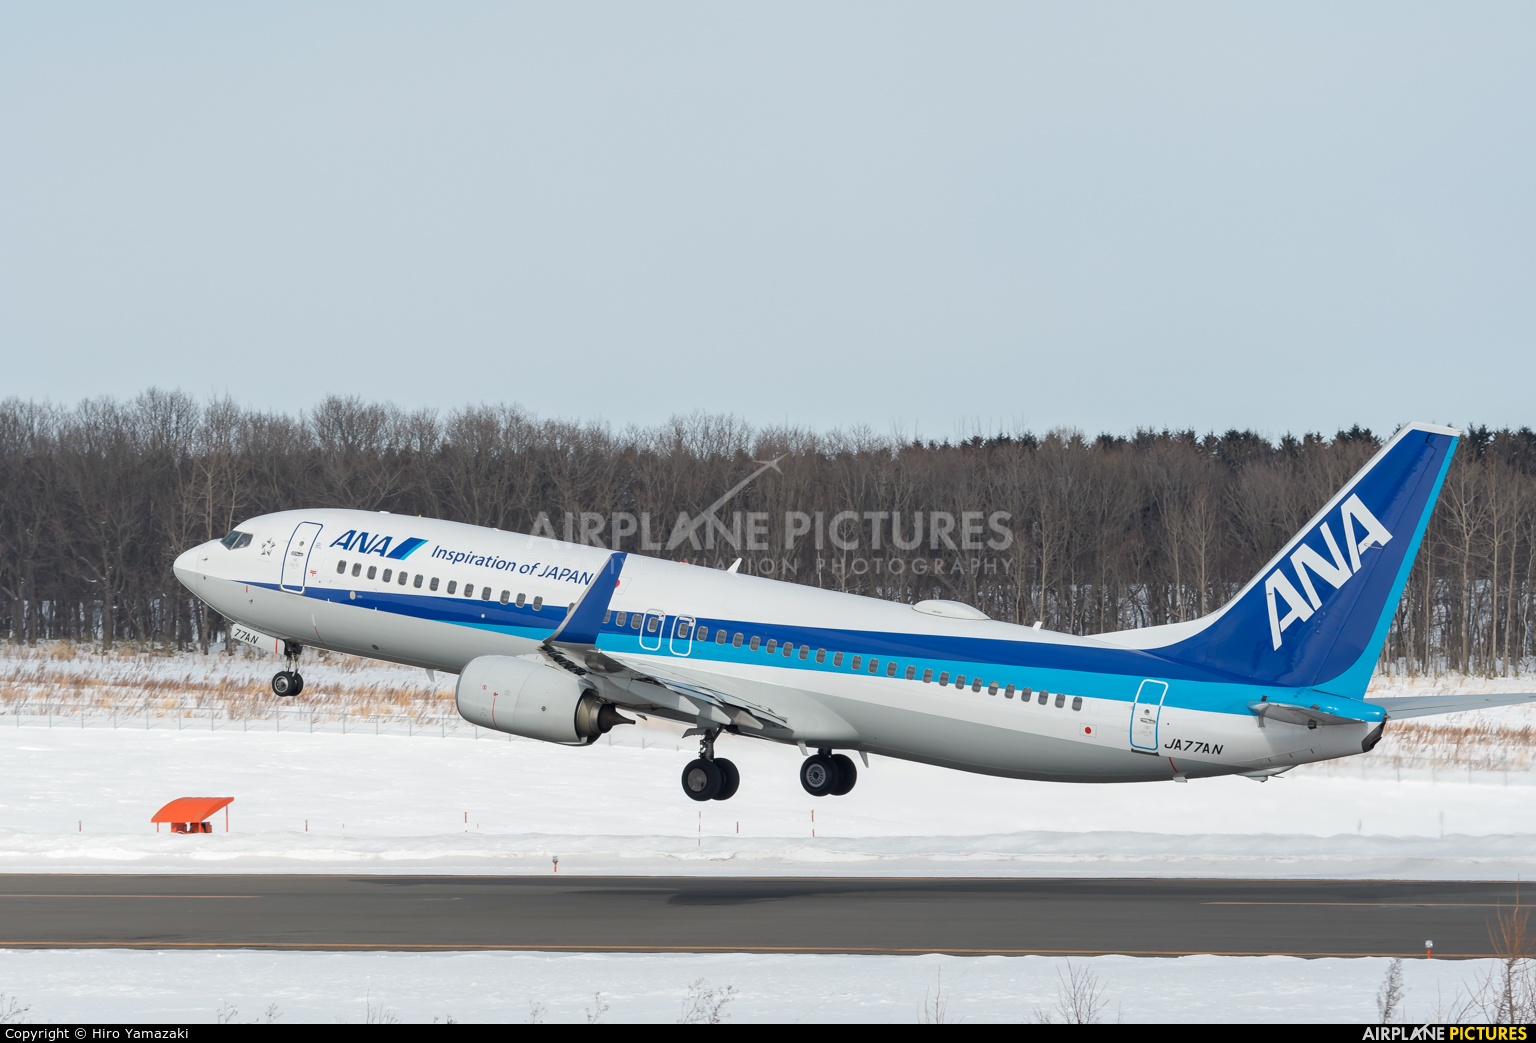 ANA - All Nippon Airways JA77AN aircraft at Okhotk Monbetsu